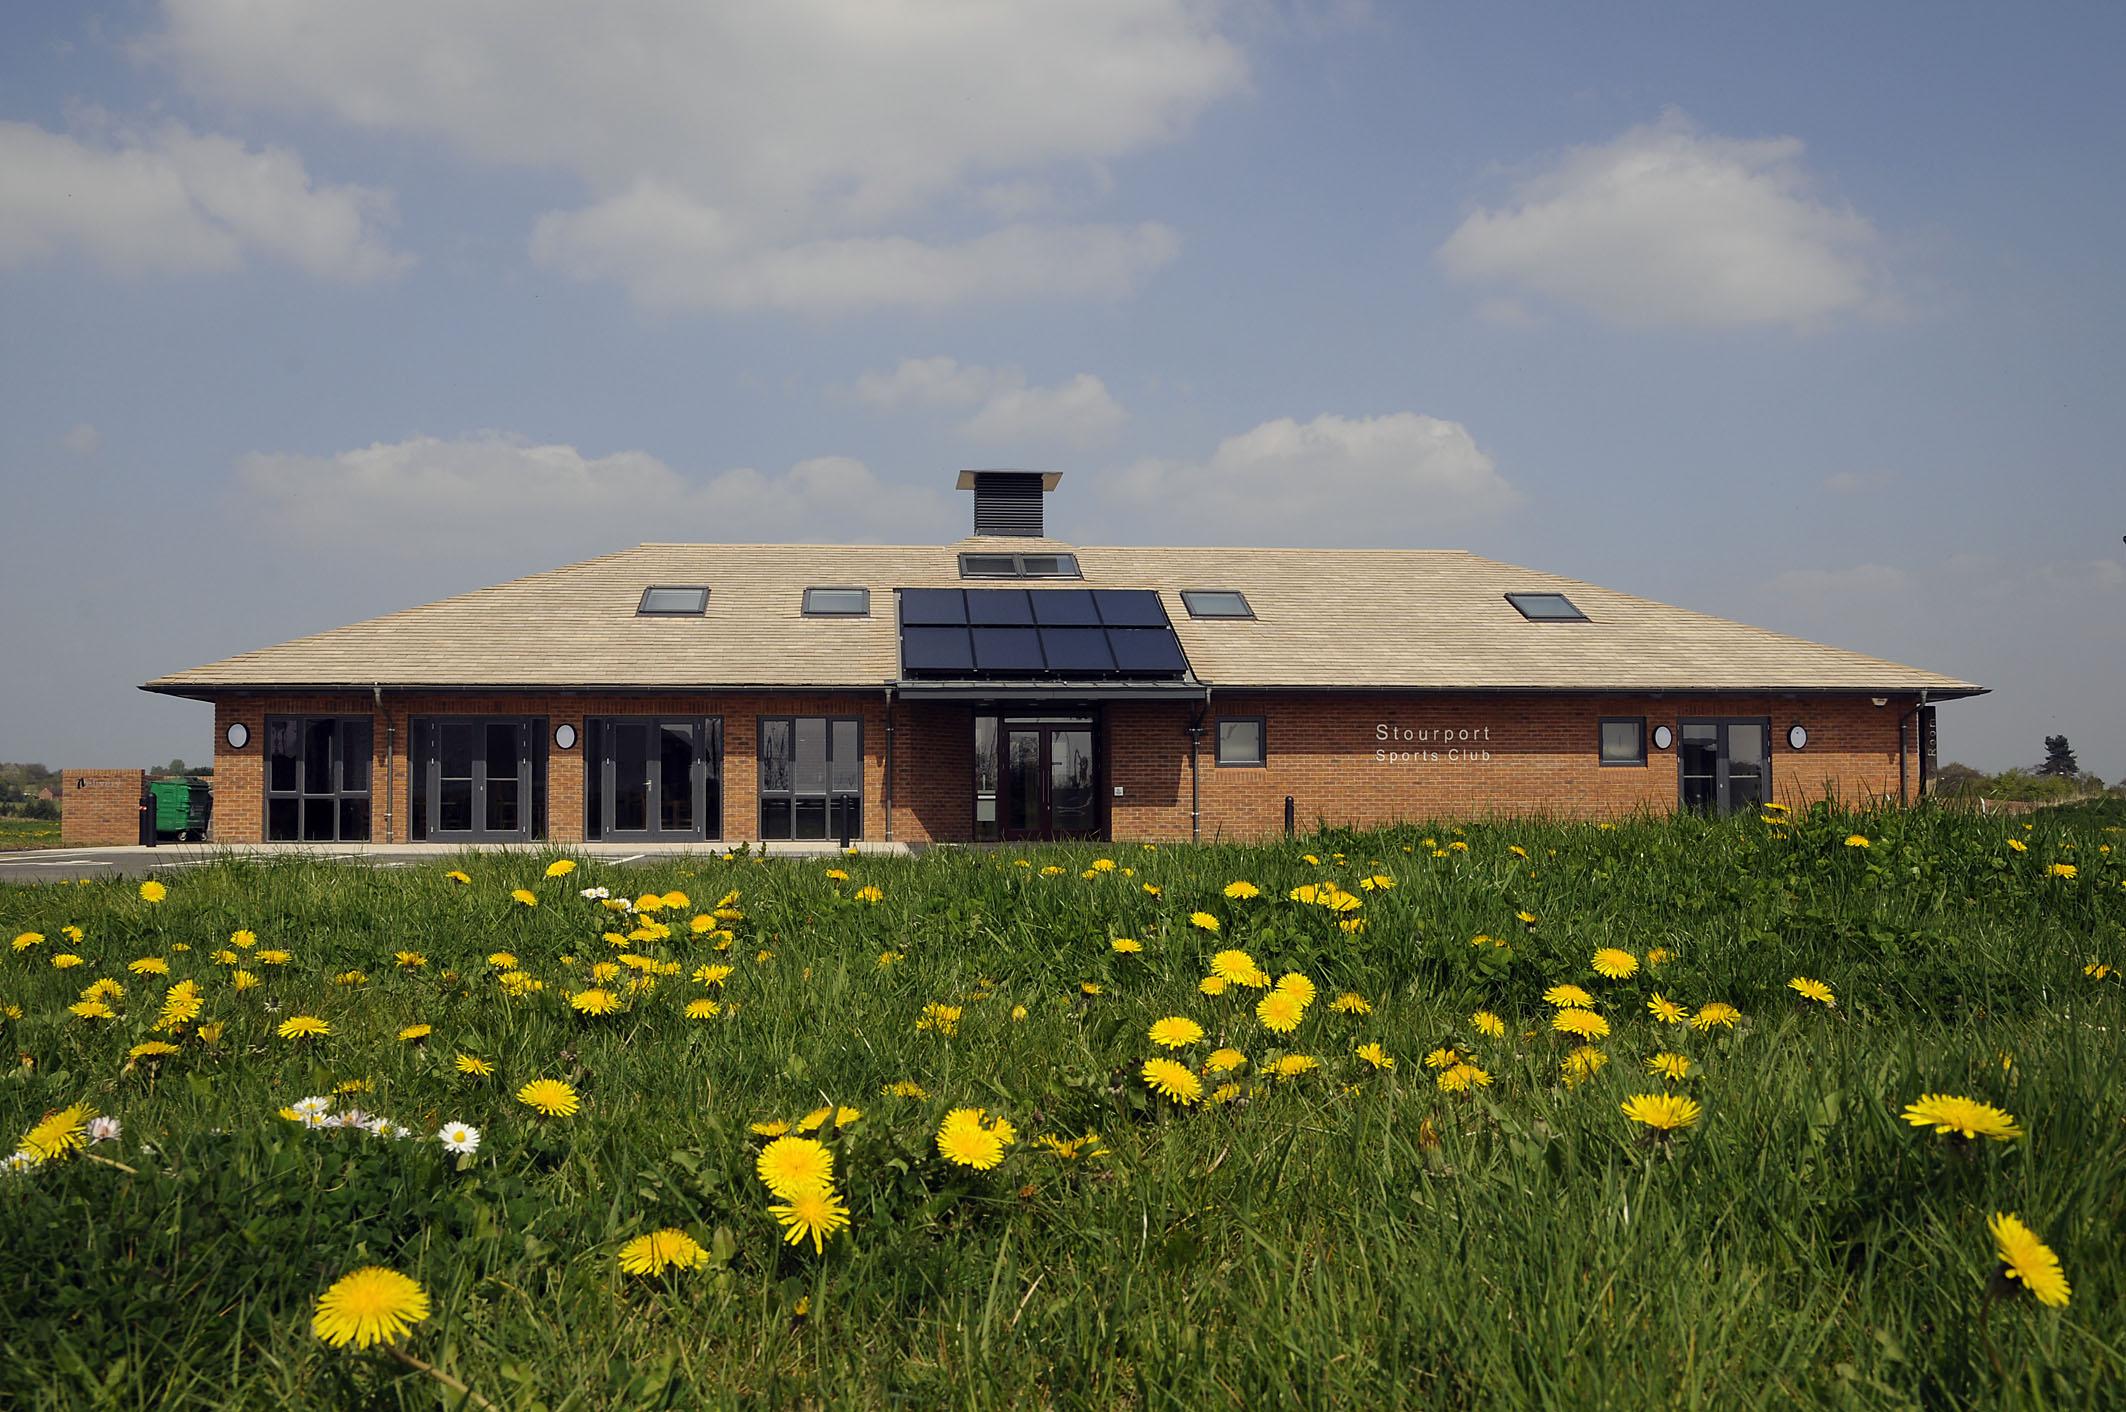 Stourport Sports Club House